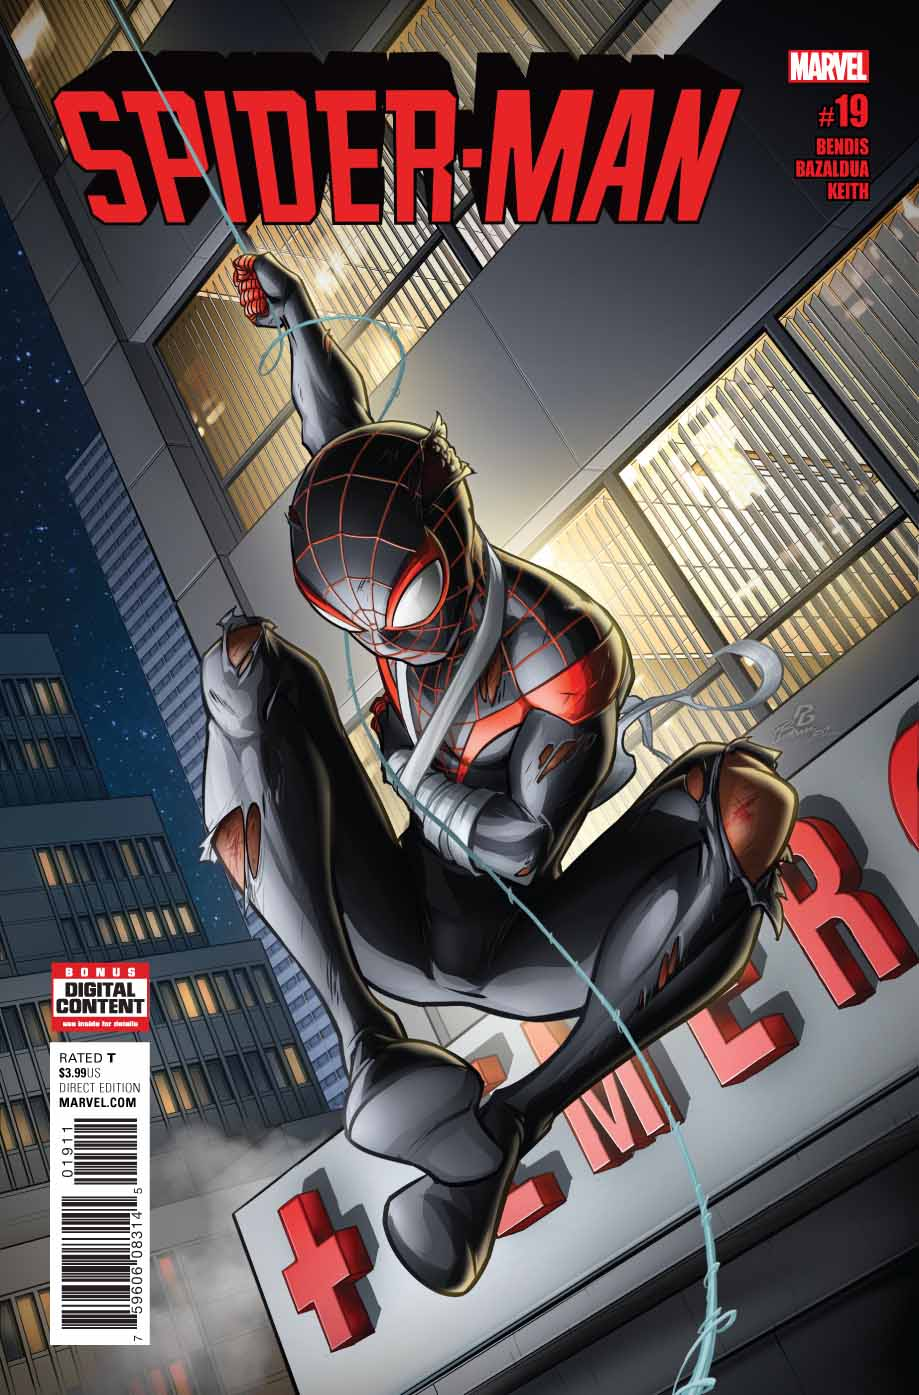 spiderman19c.jpg